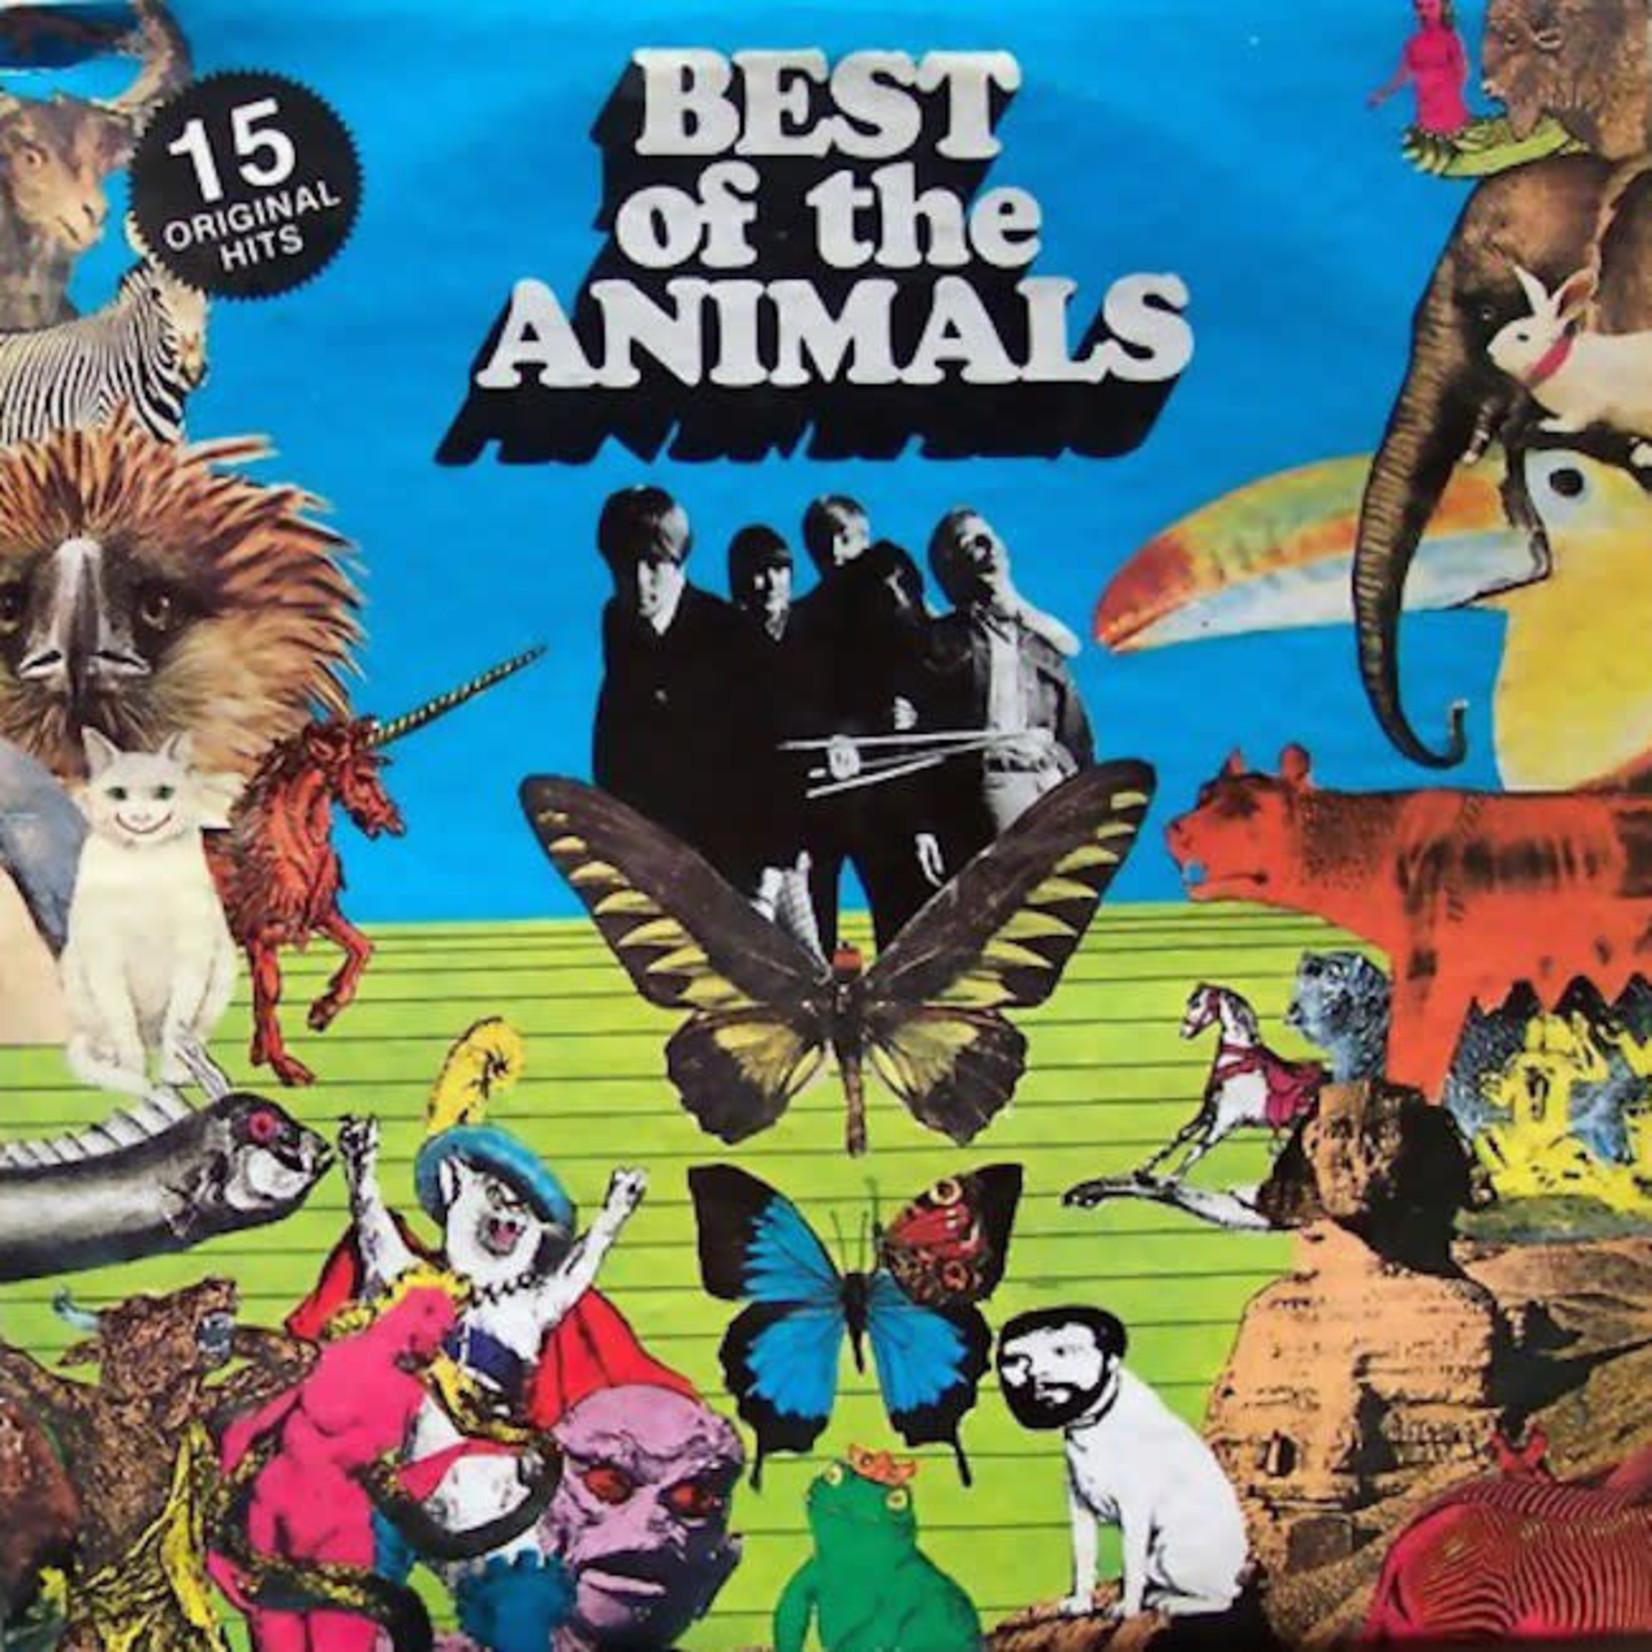 [Vintage] Animals: Best of... (15 Original Hits)